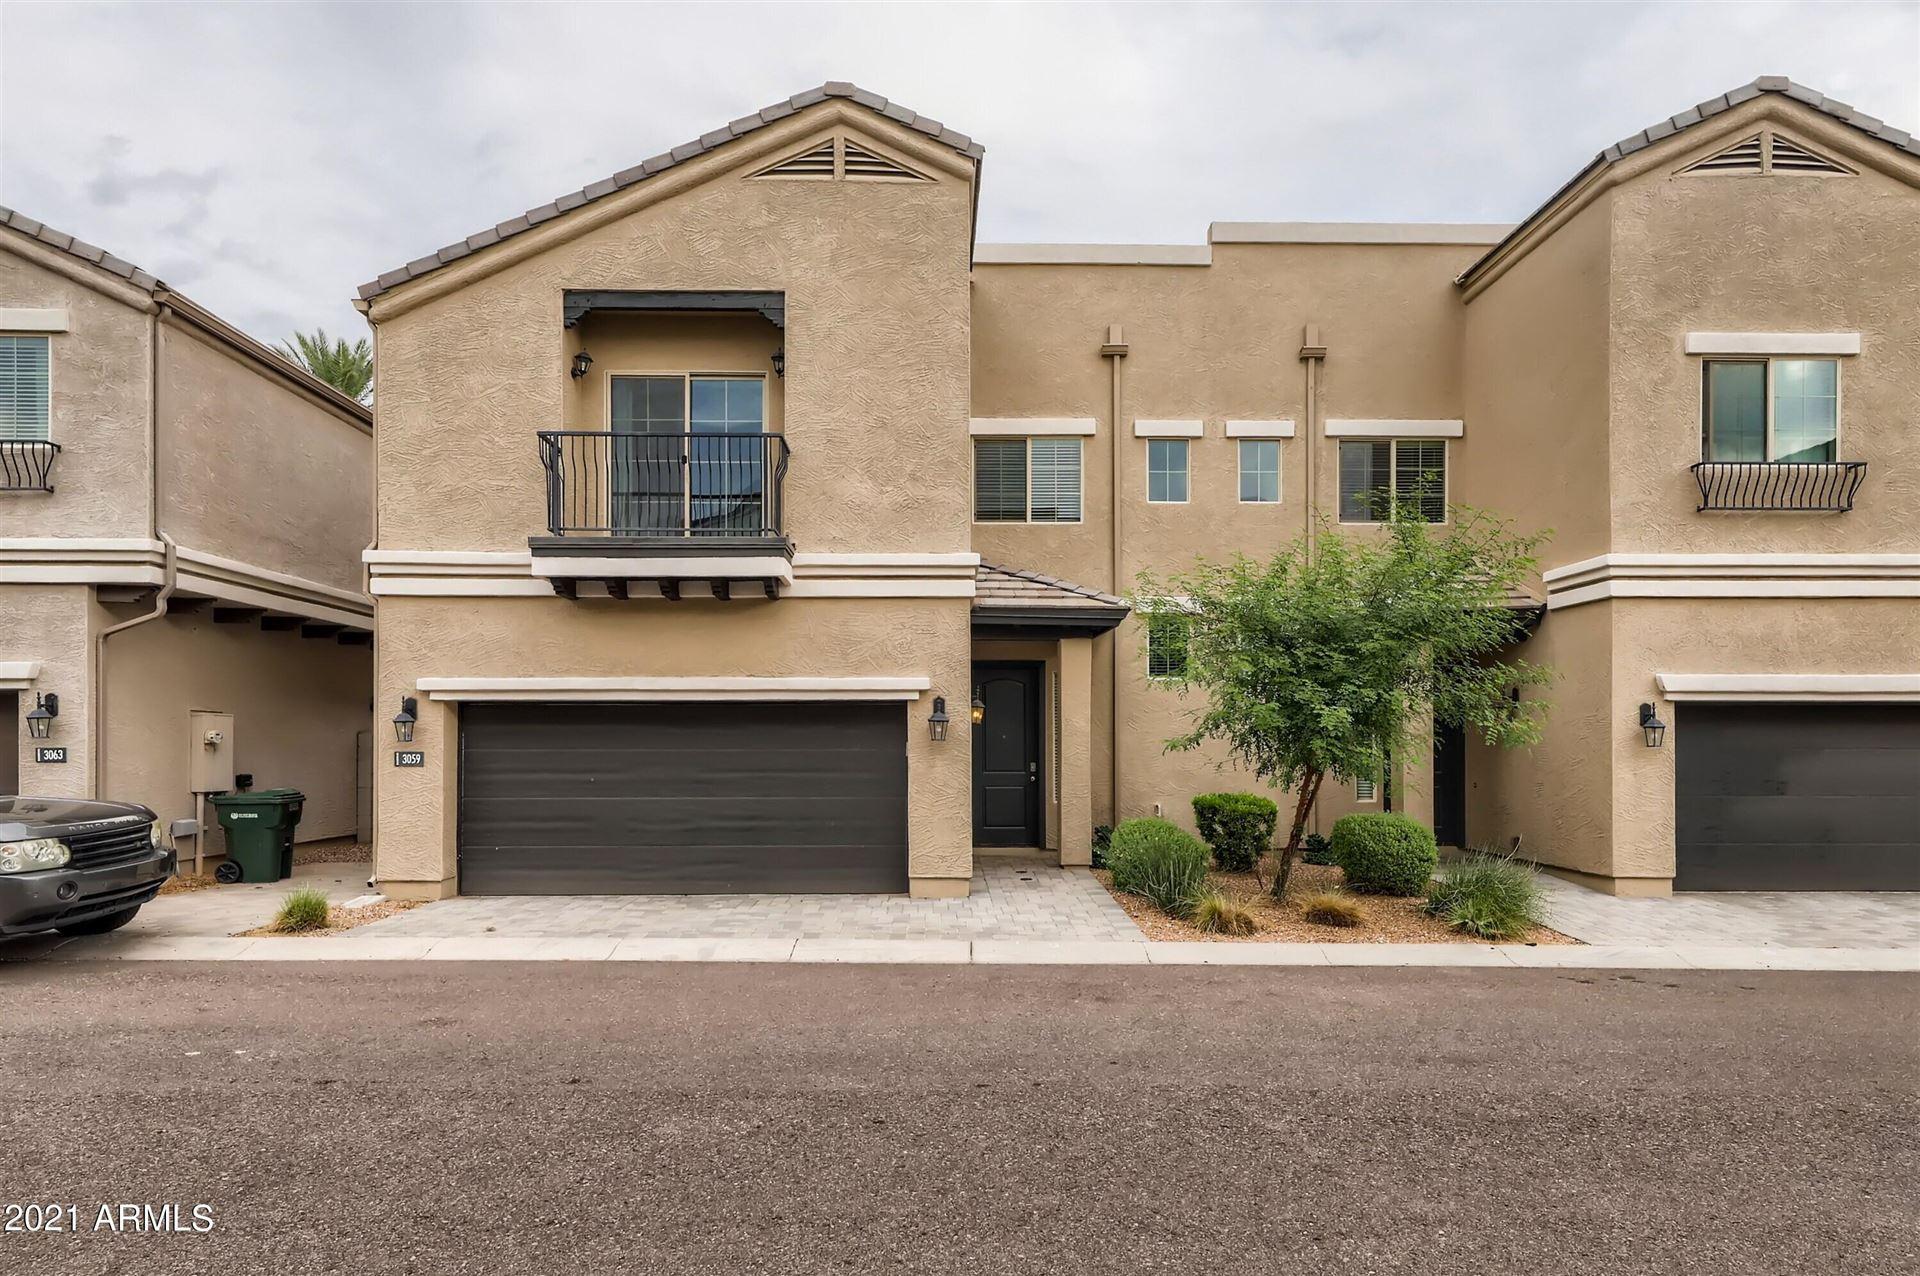 3059 N 33RD Place, Phoenix, AZ 85018 - MLS#: 6300225